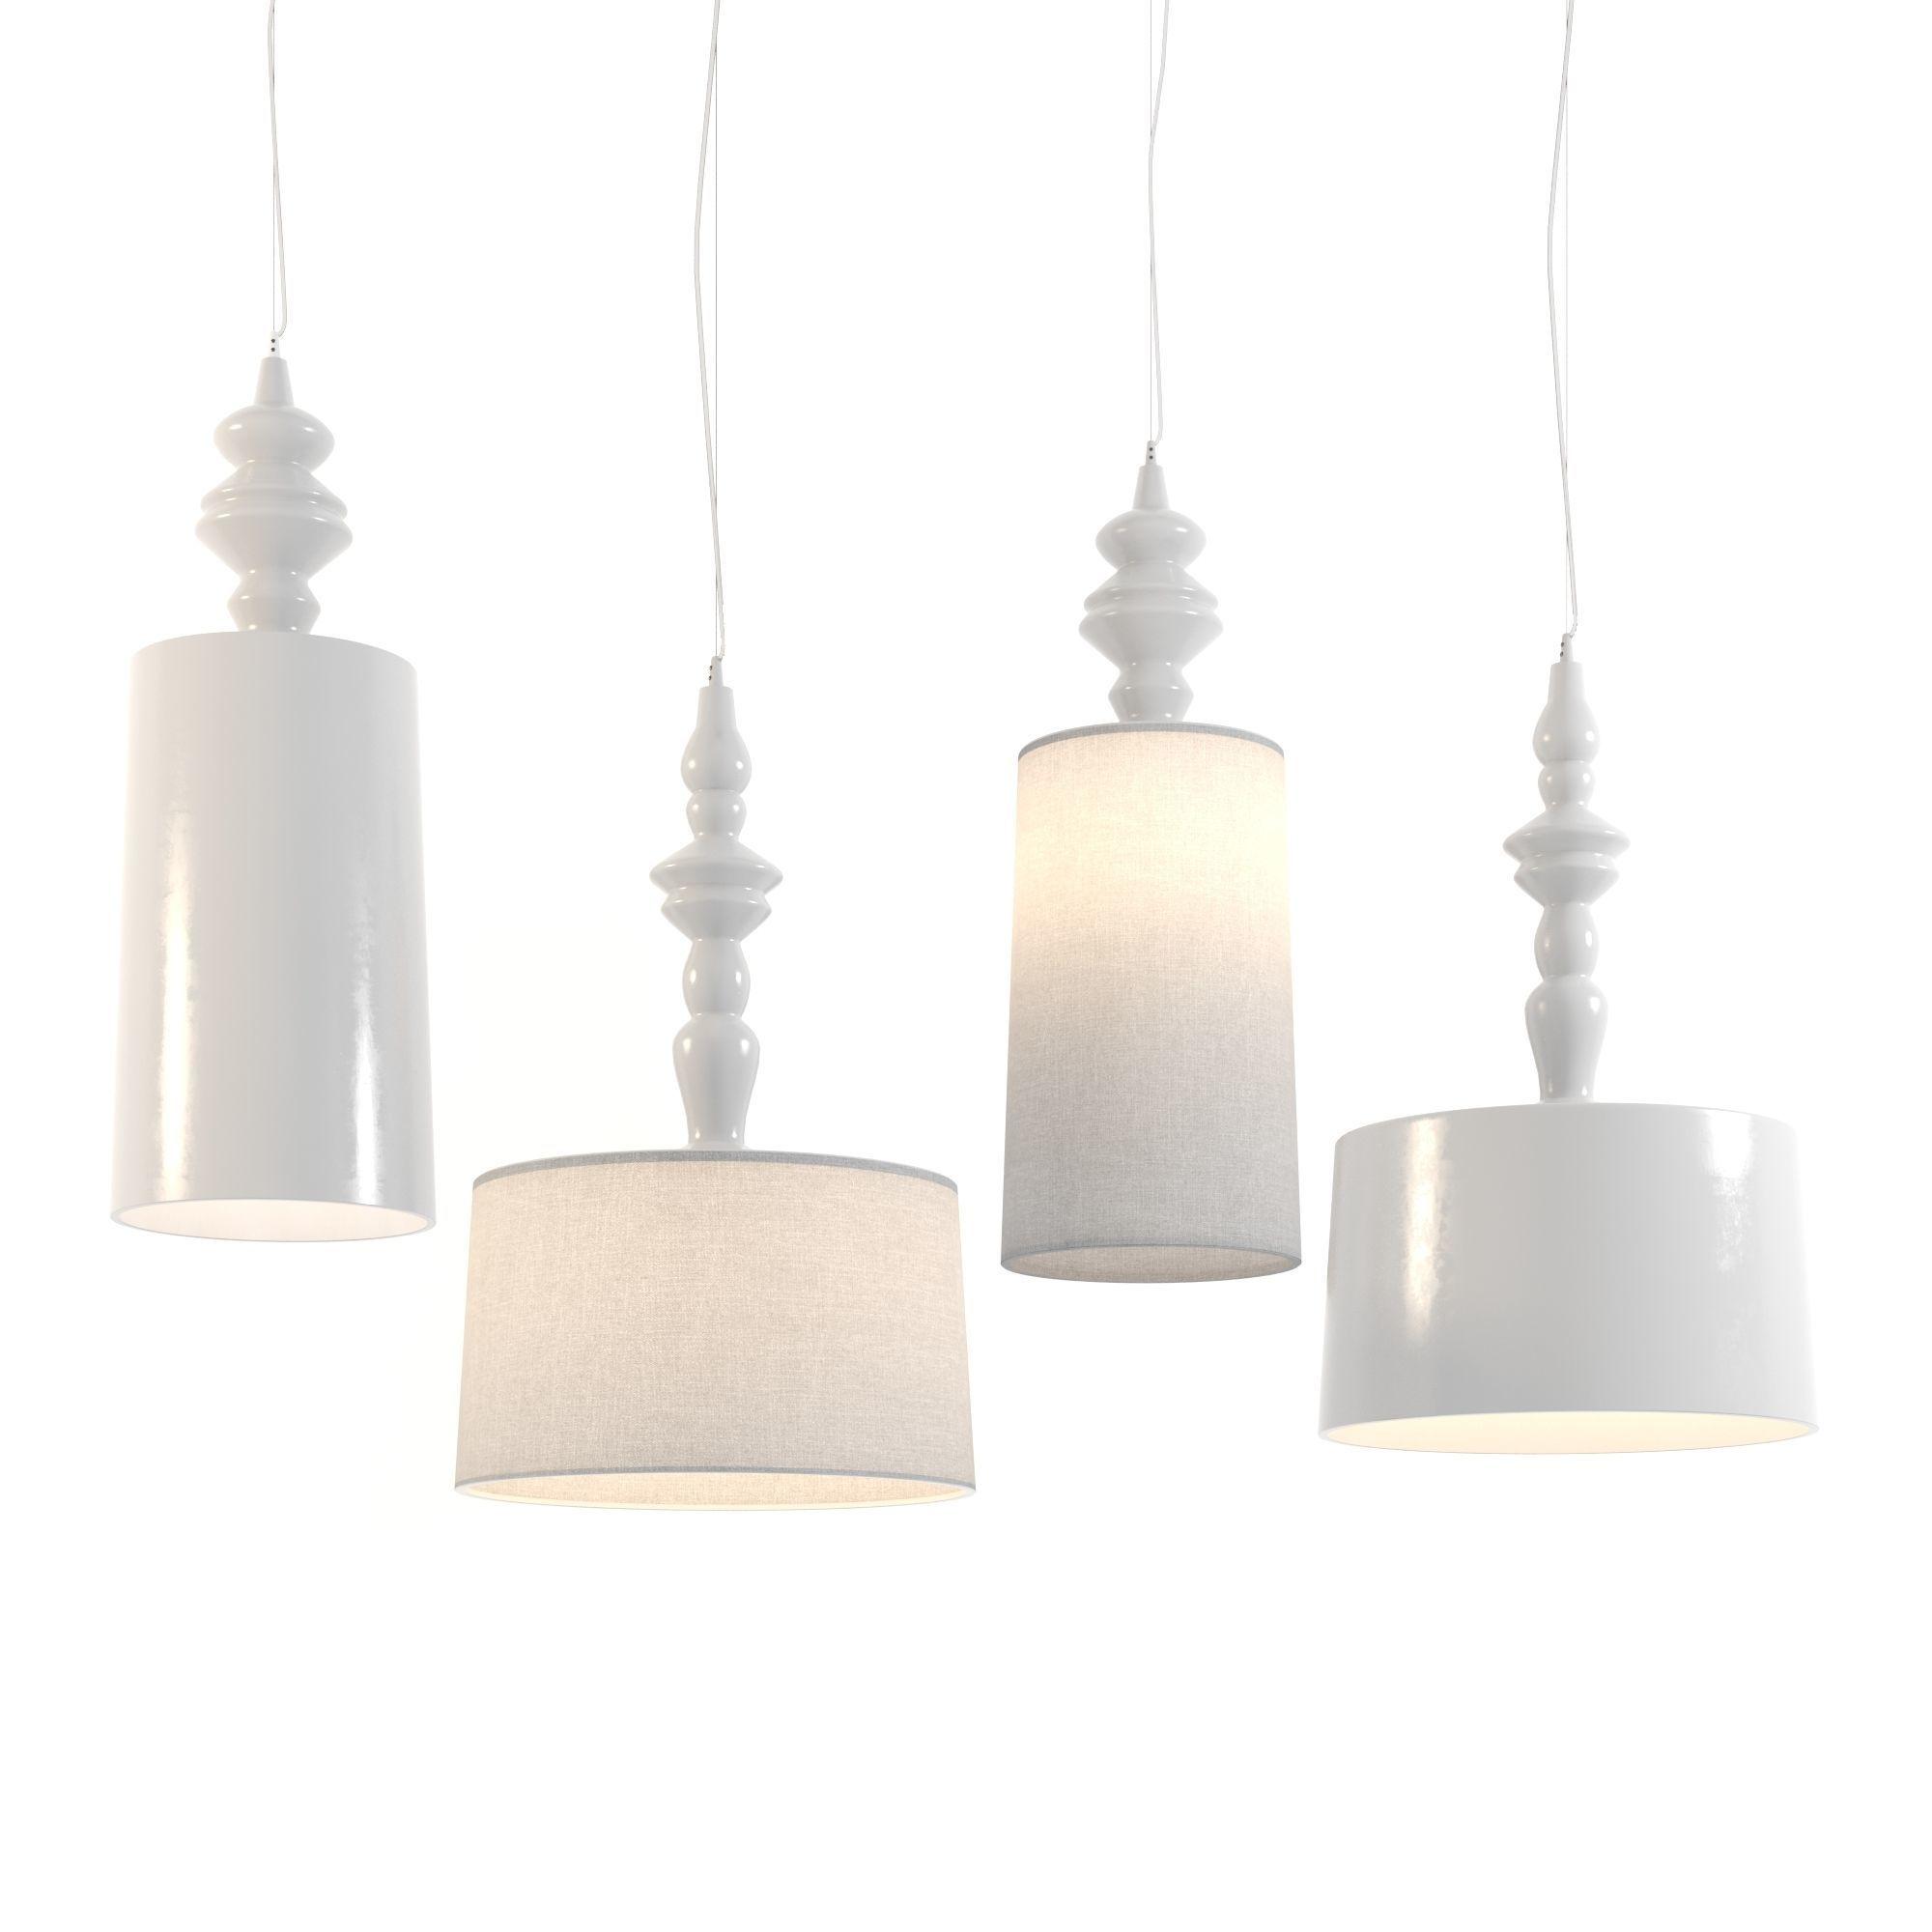 KARMAN Ali e Baba suspension lamps